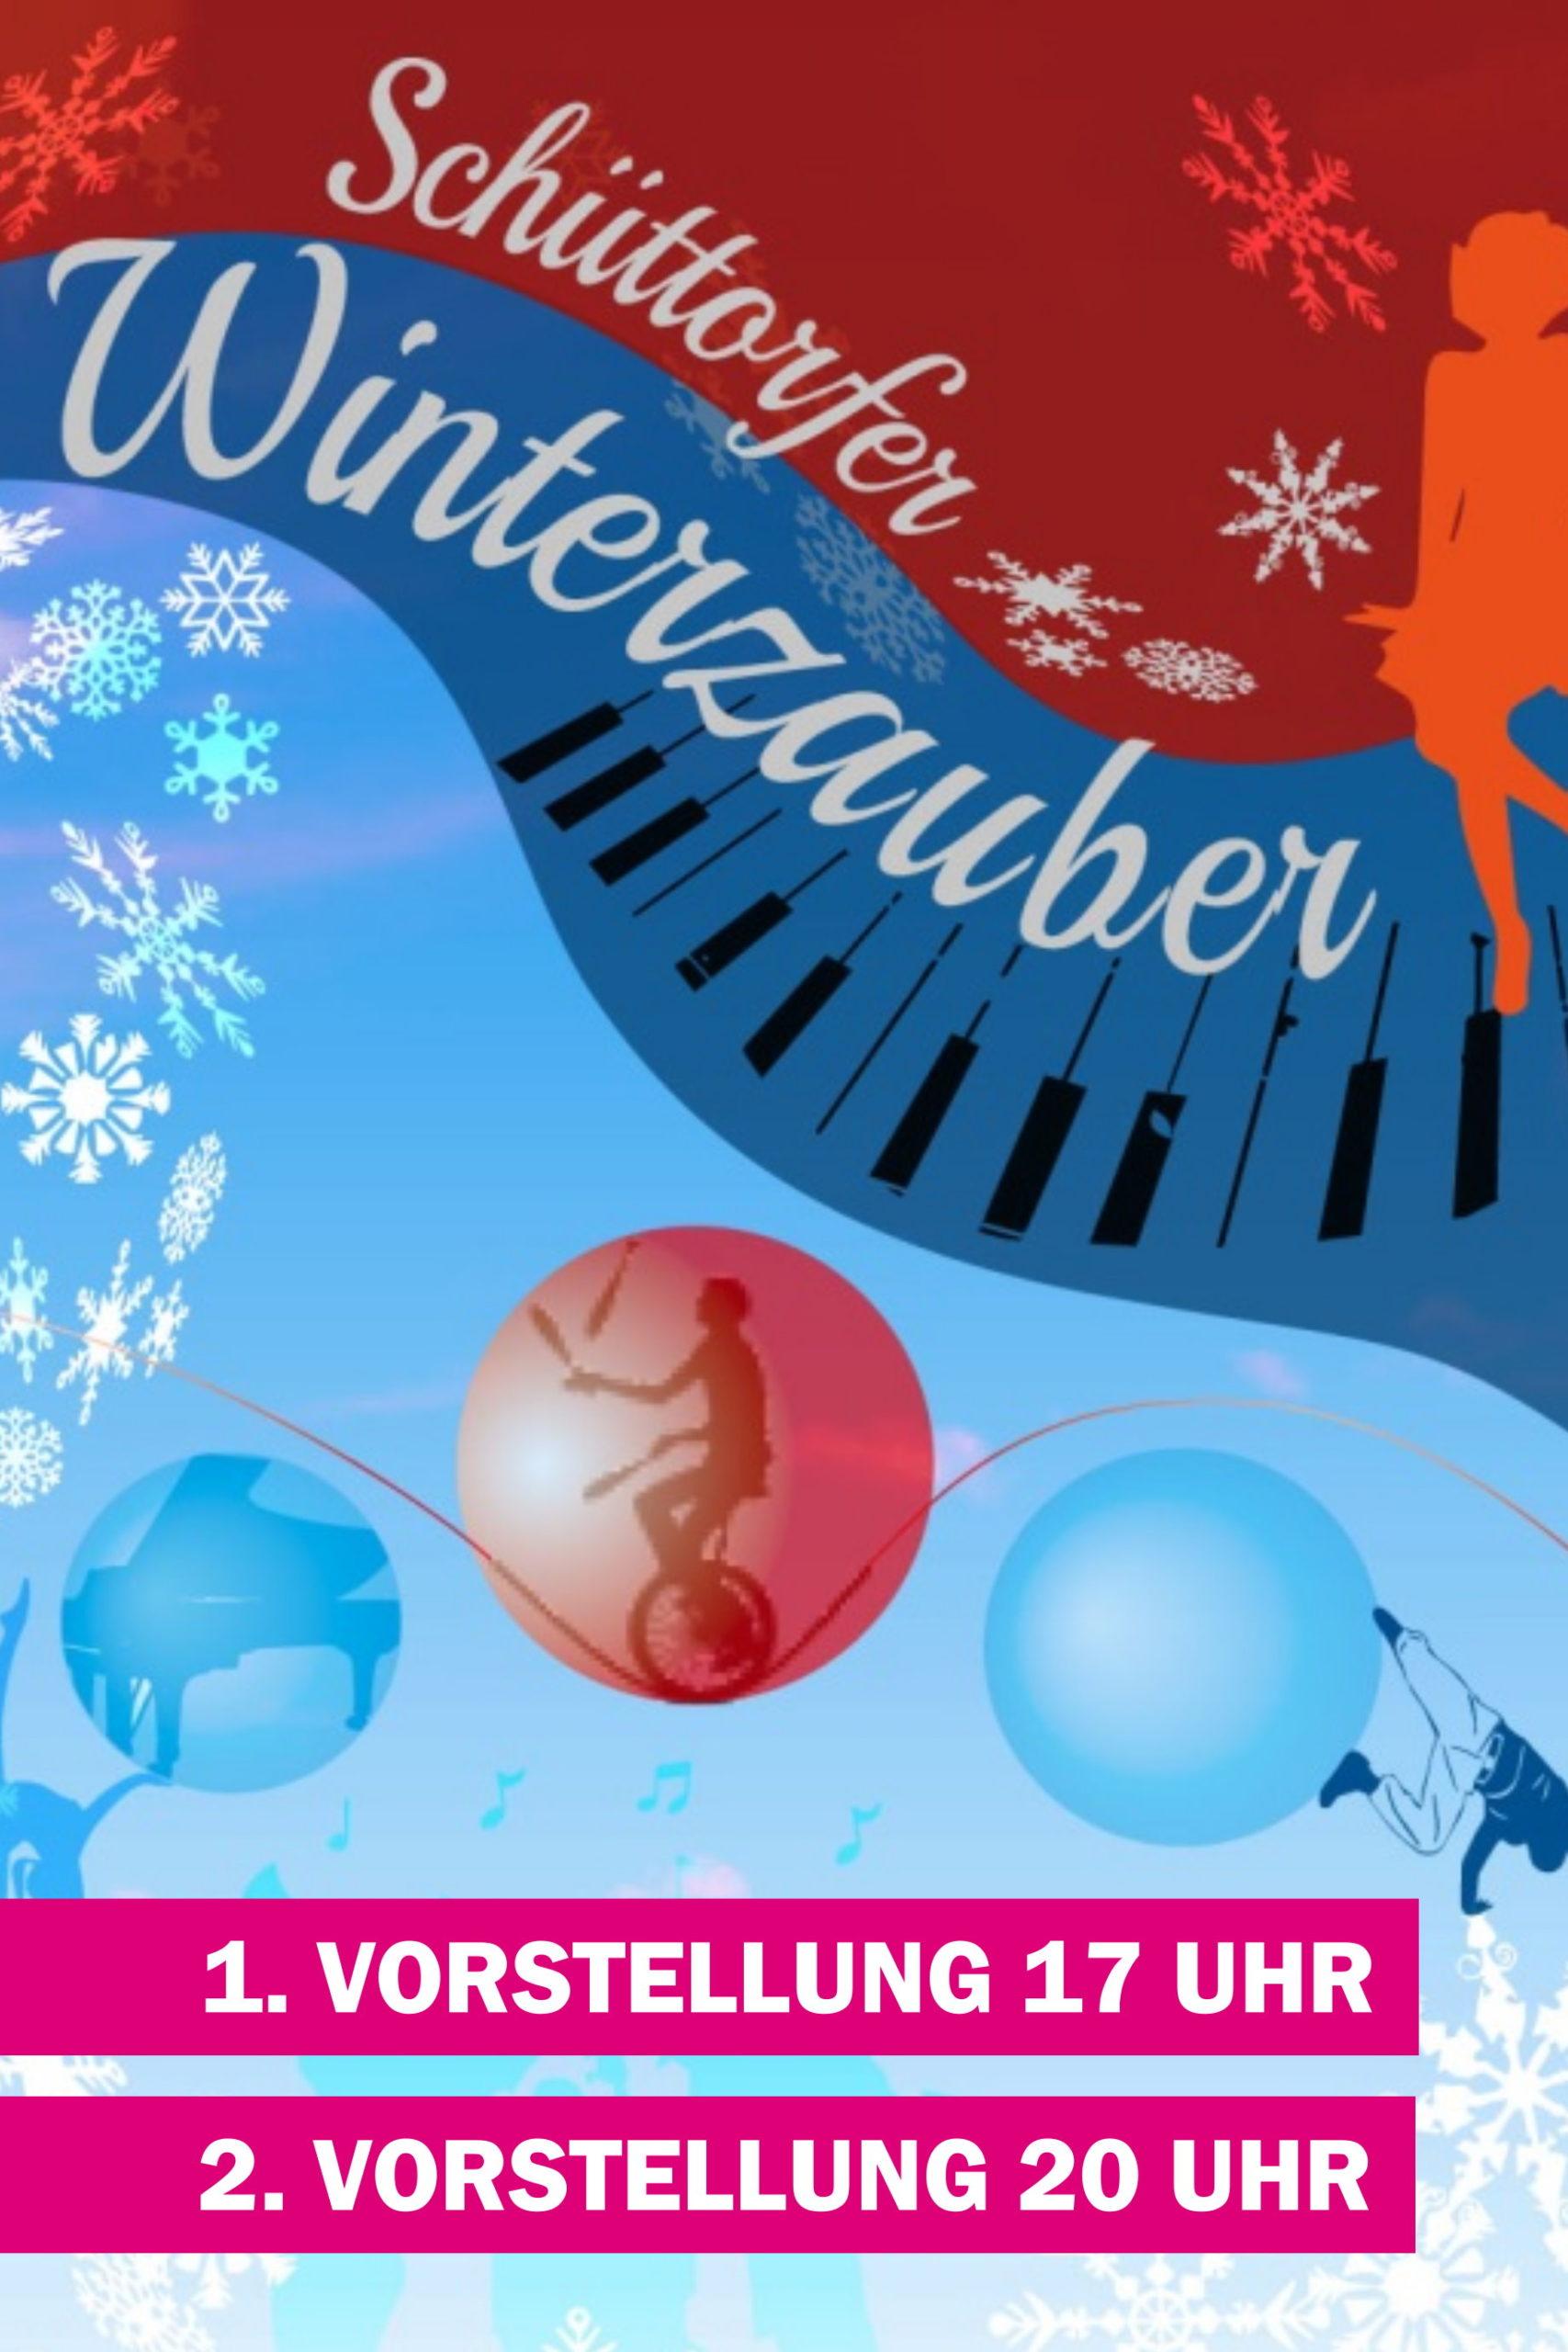 <b>16.01.2021</b><br>17:00 Uhr / 20:00 Uhr<br><b>Schüttorfer Winterzauber</b>